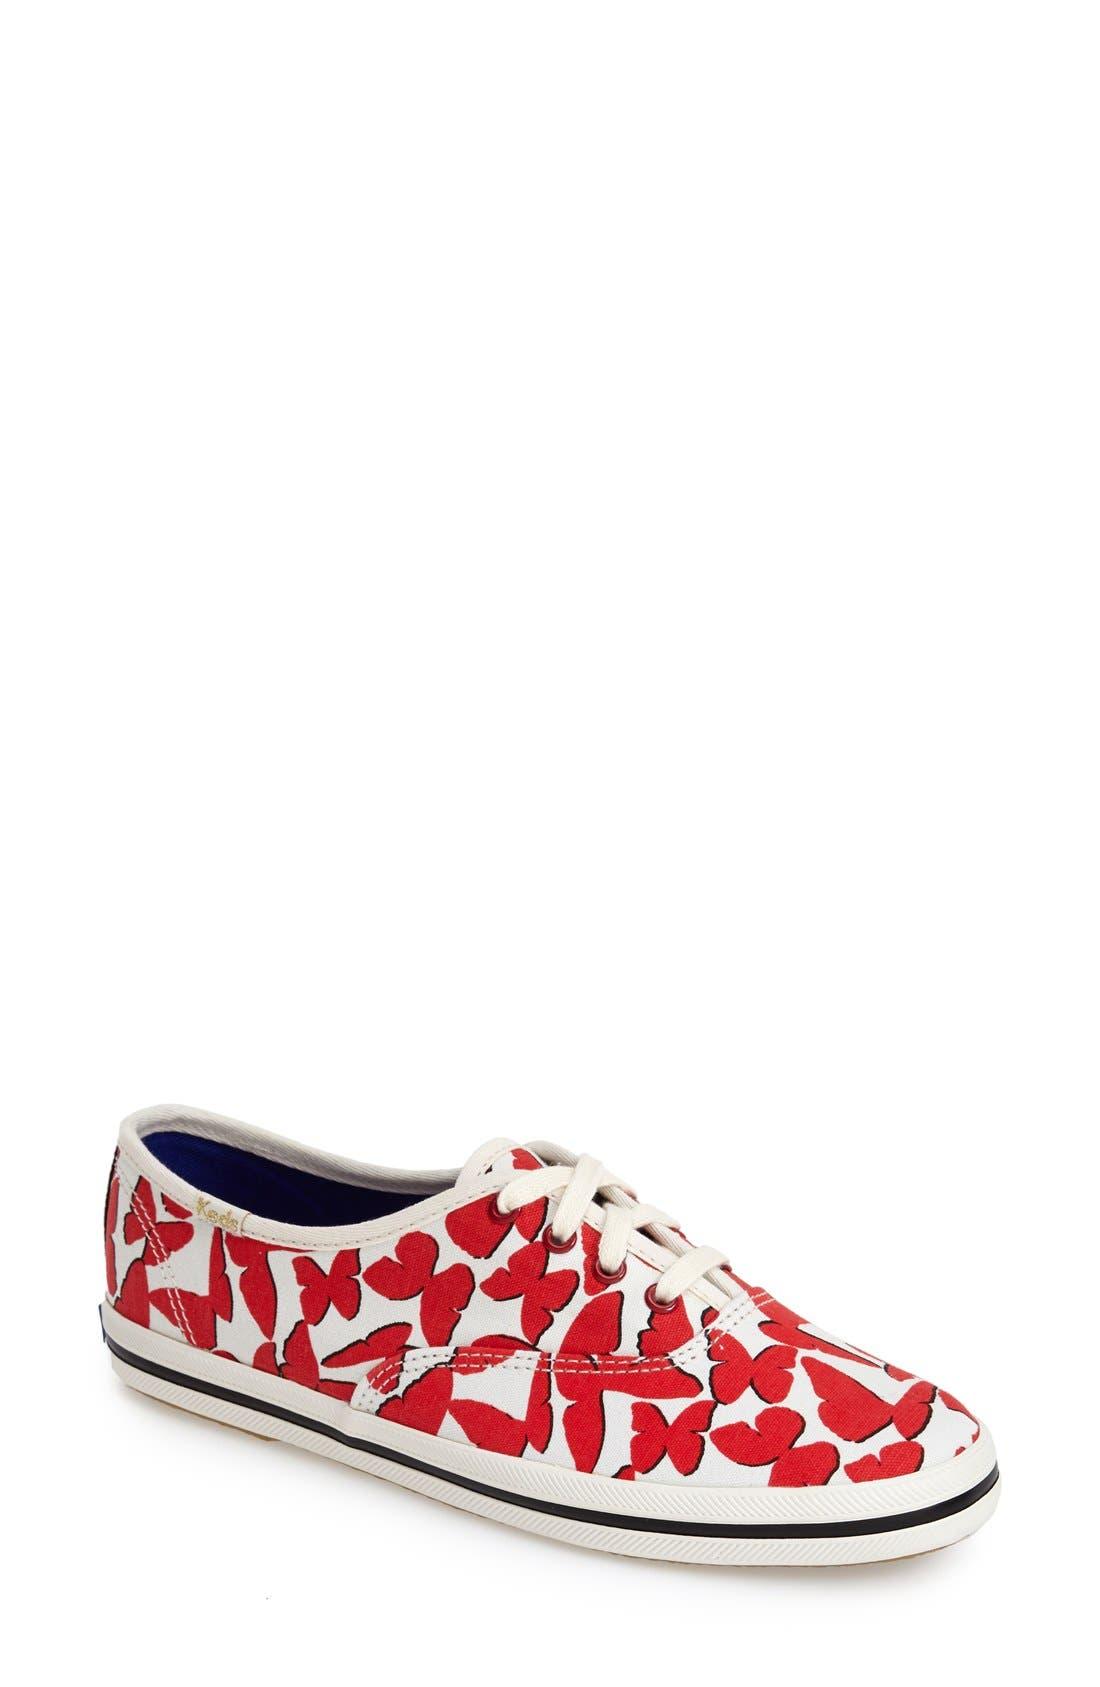 Main Image - Keds® for kate spade new york 'kick' sneaker (Women)